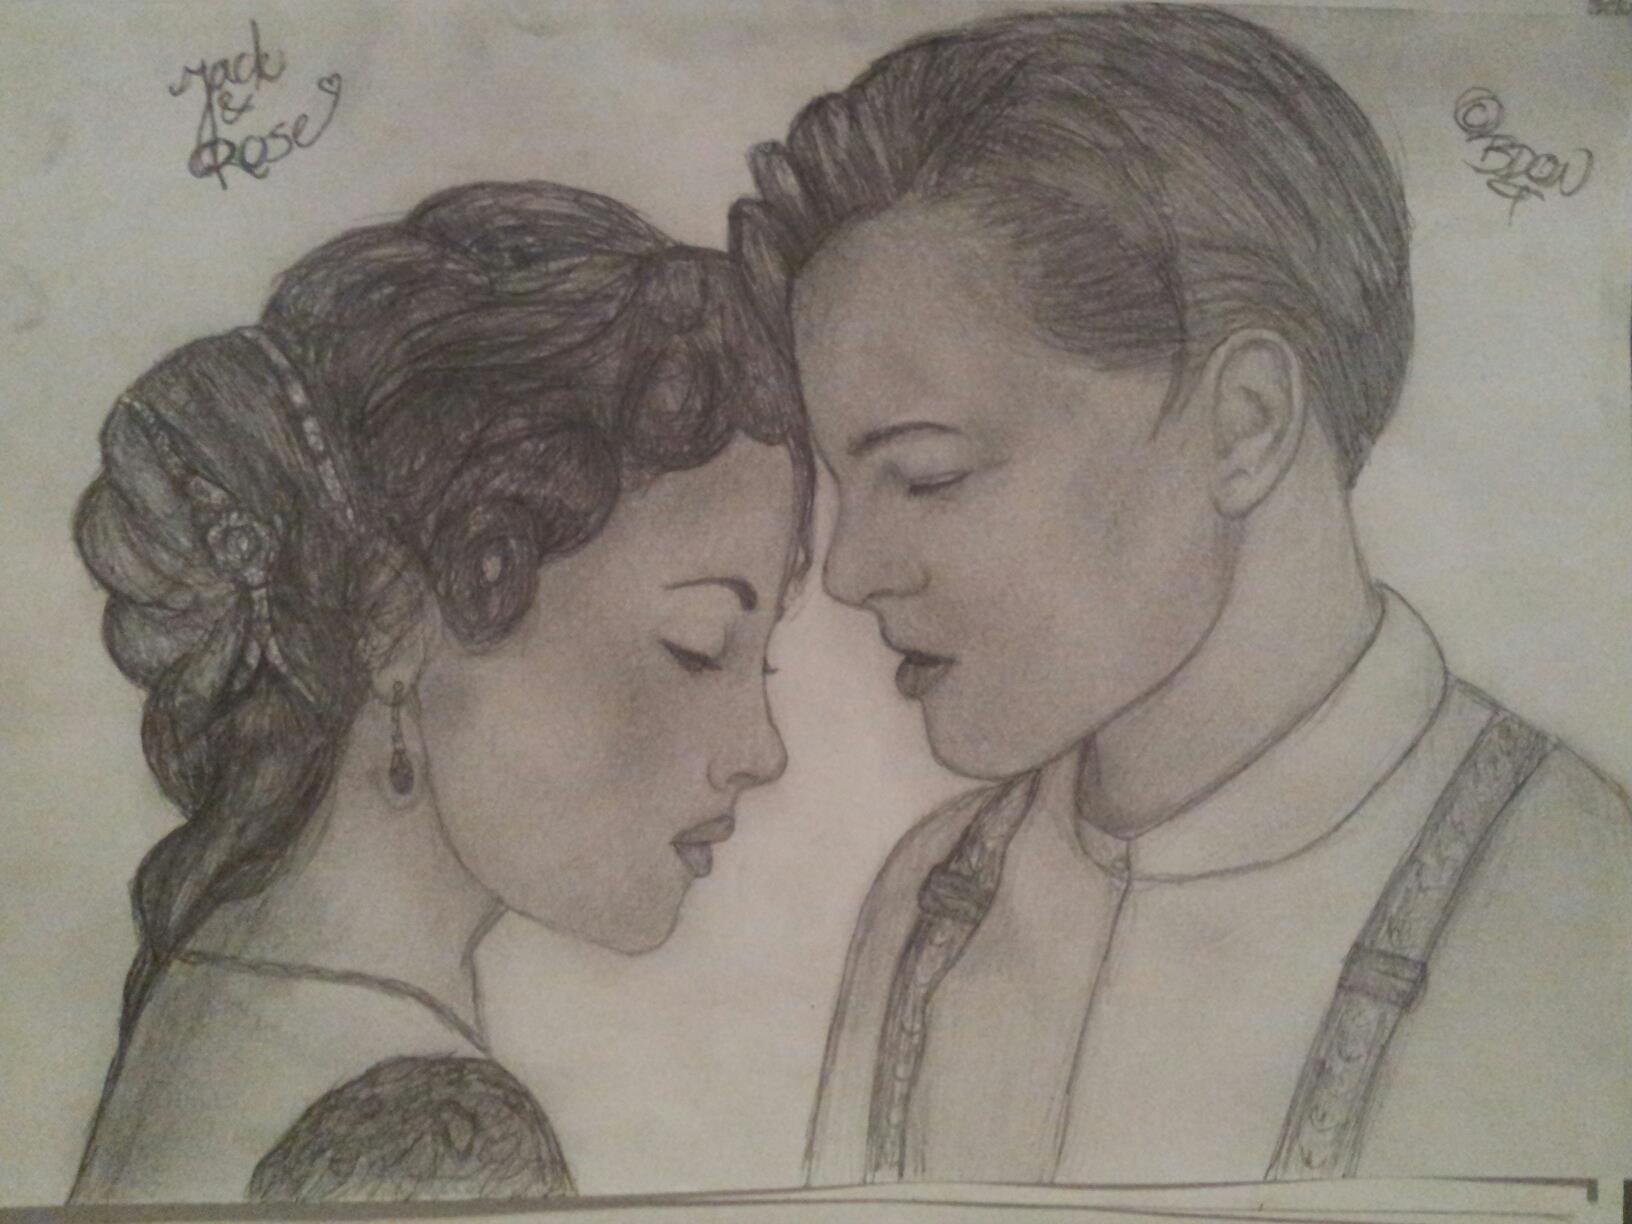 Drawn titanic titanic movie jack Imgur Drawing the & jpg